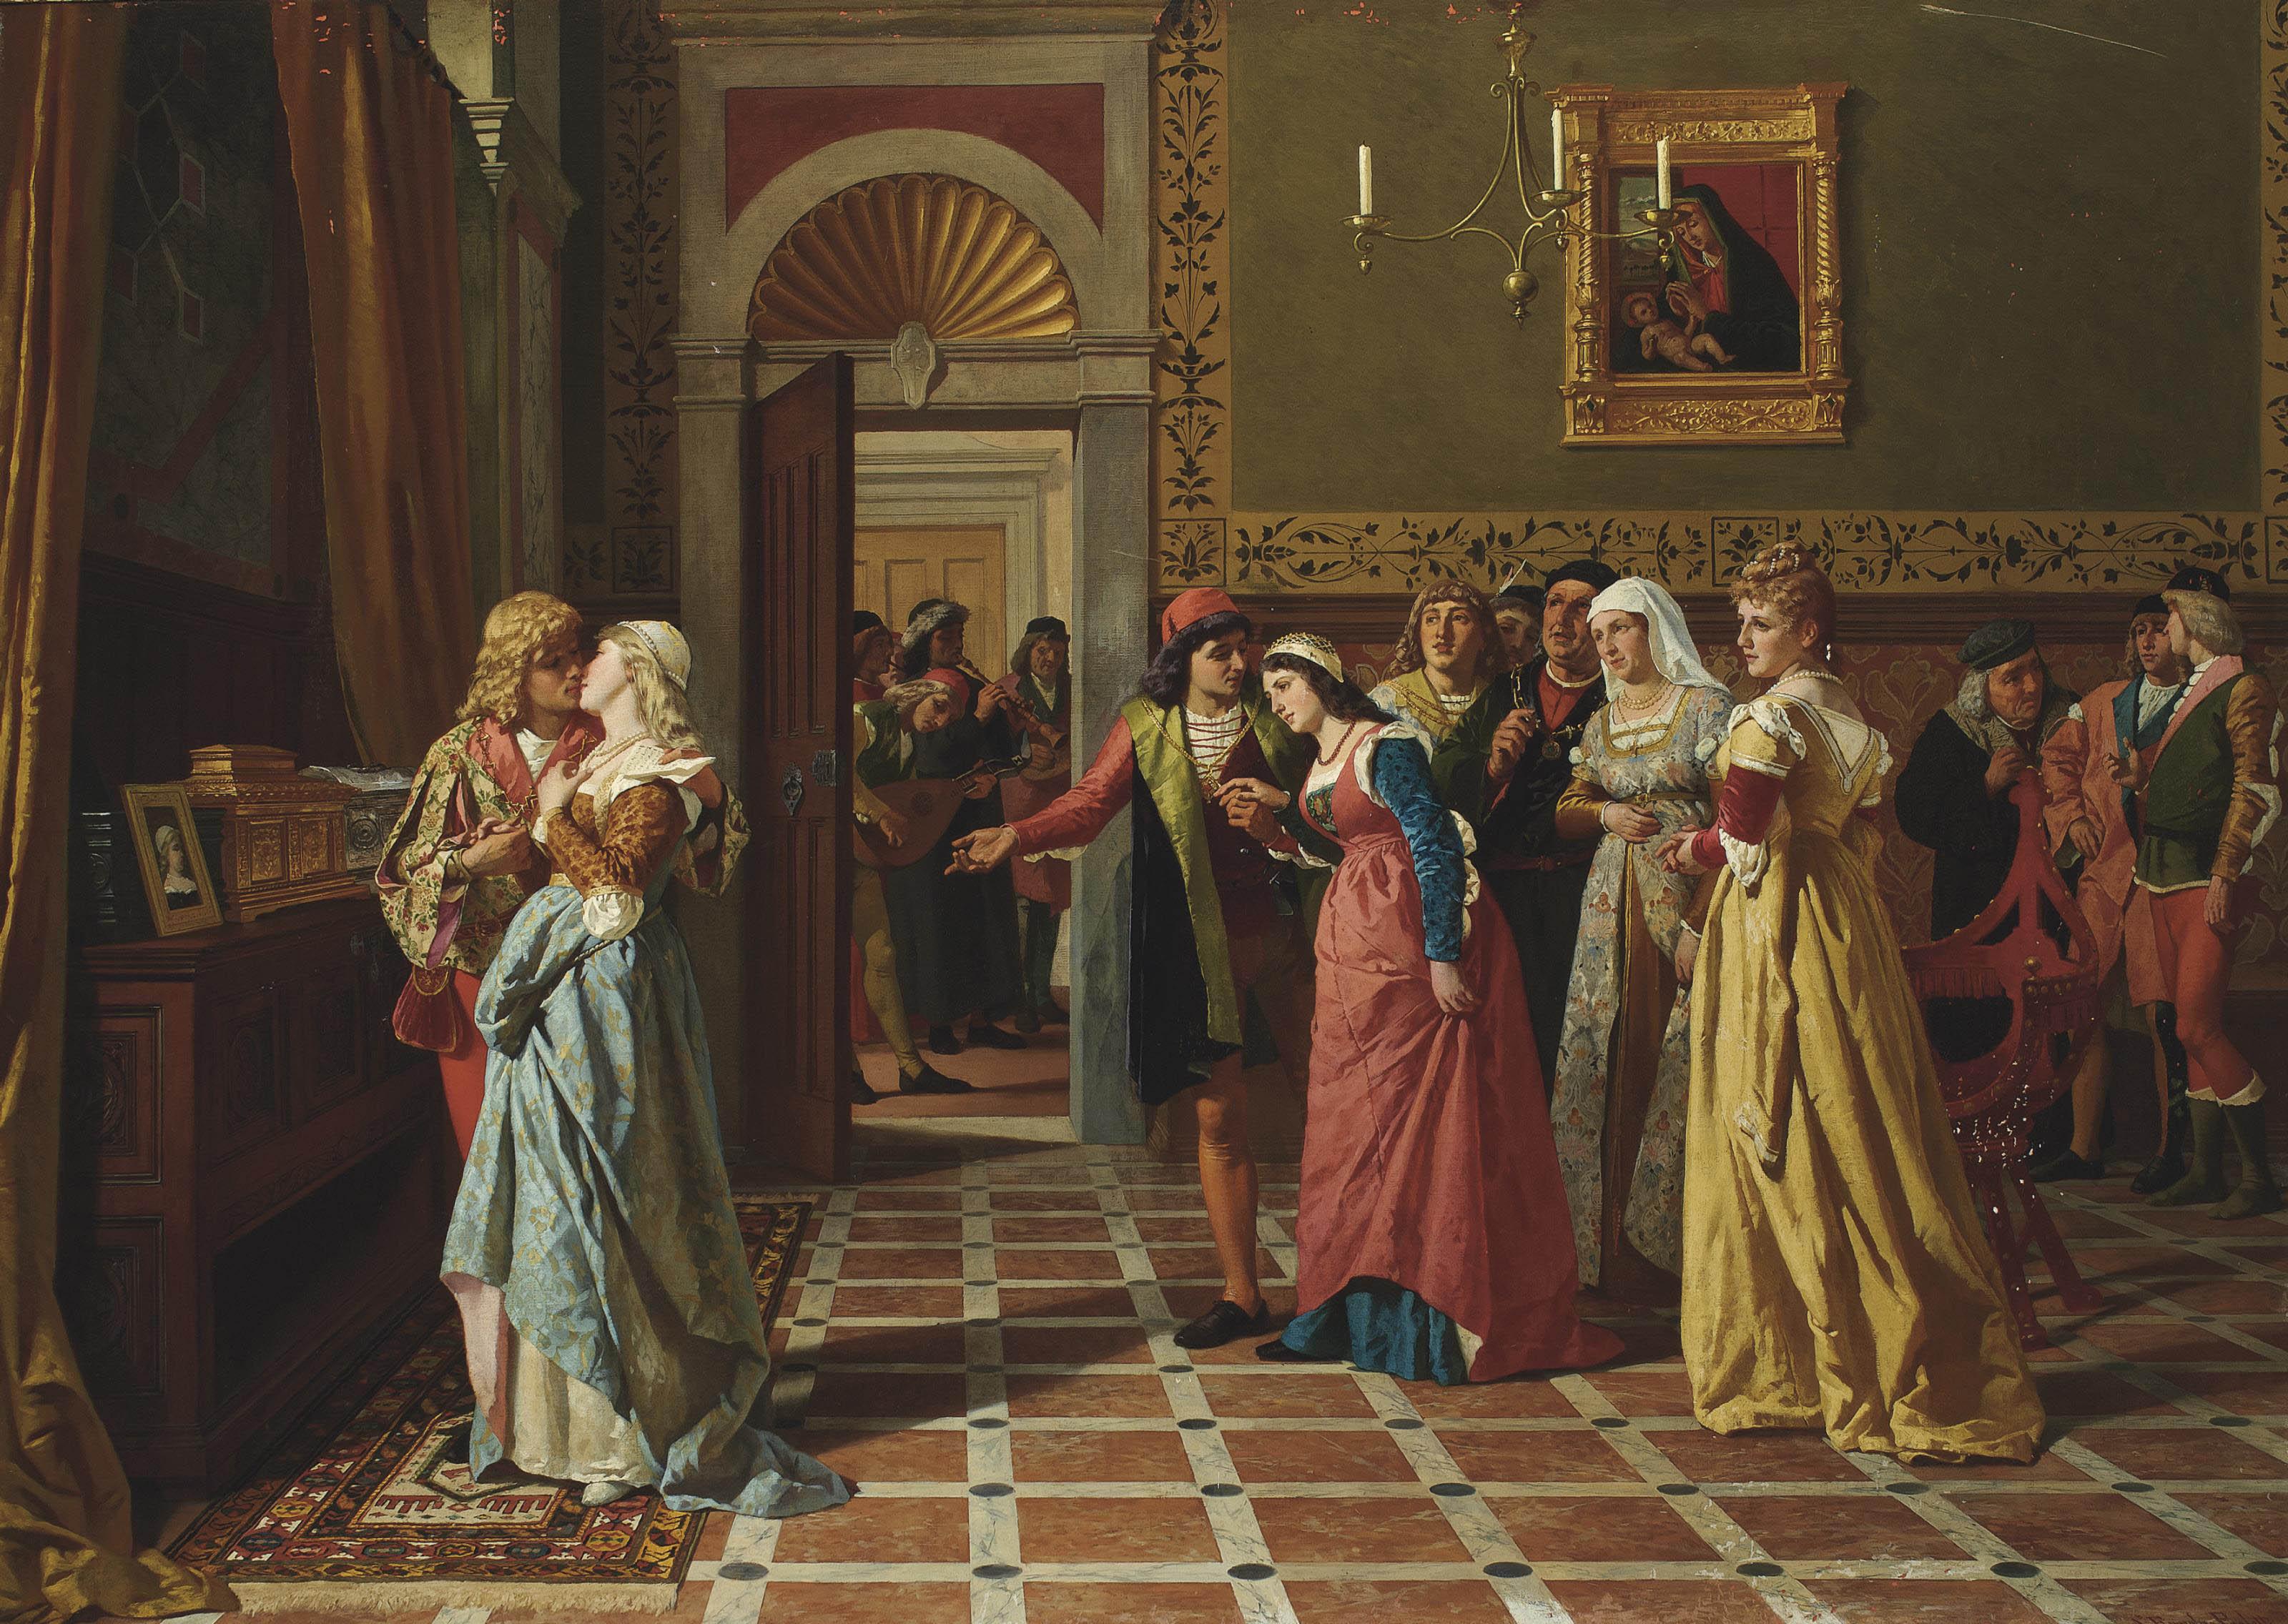 Bassanio winning the heart of Portia, The Merchant of Venice